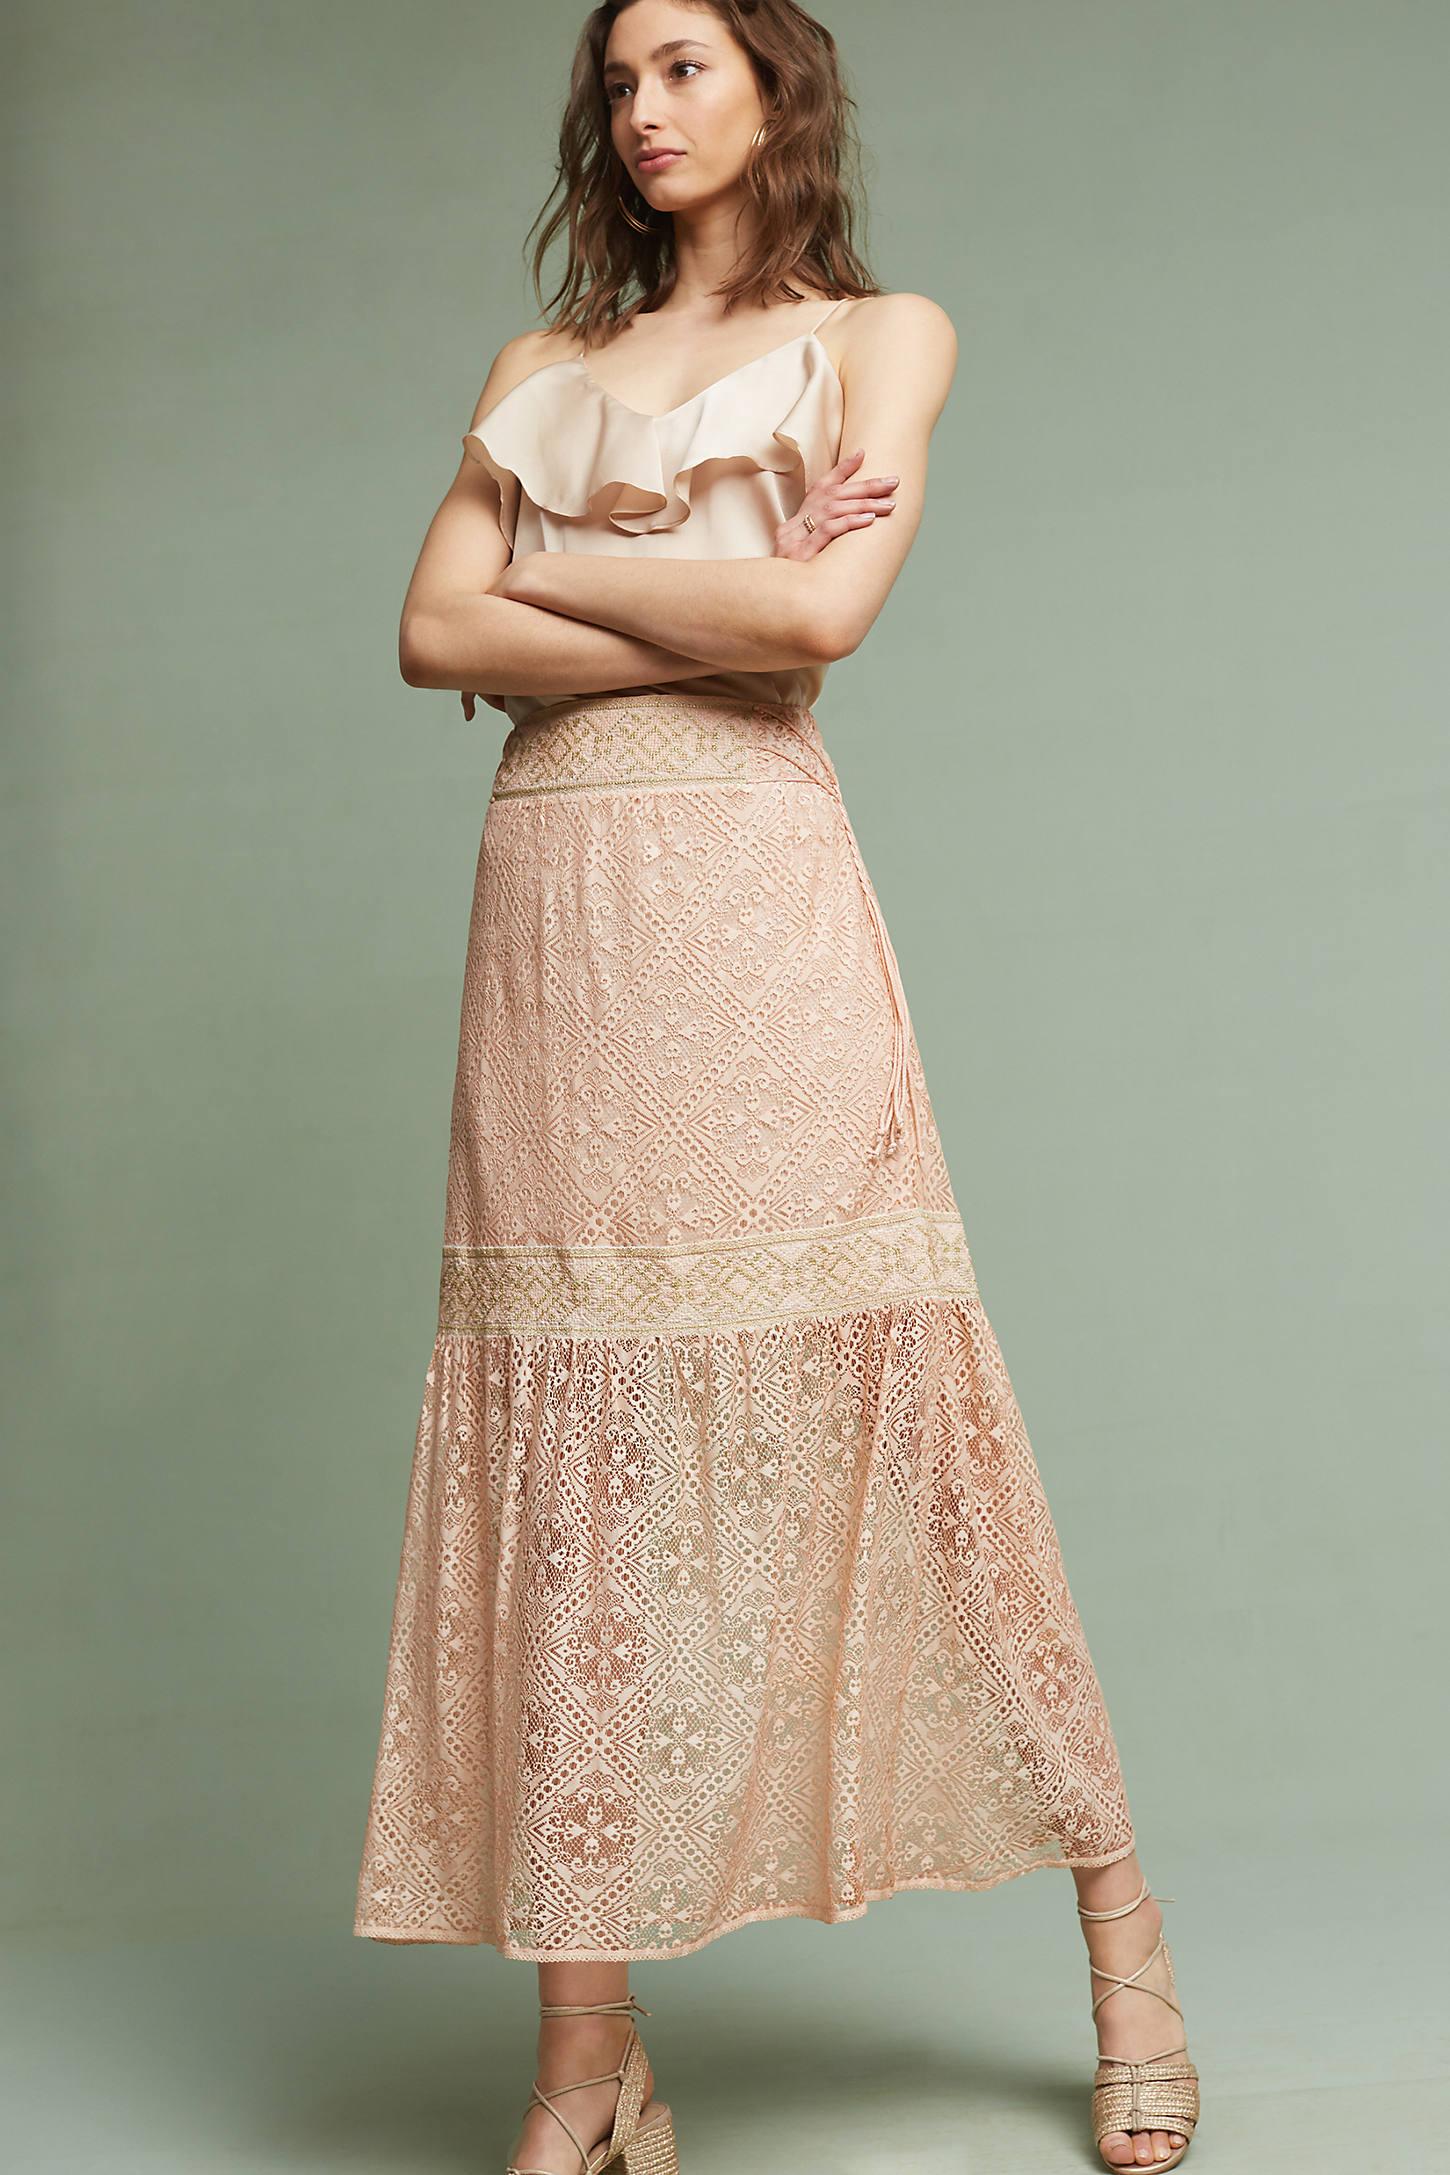 Maxima Lace Skirt